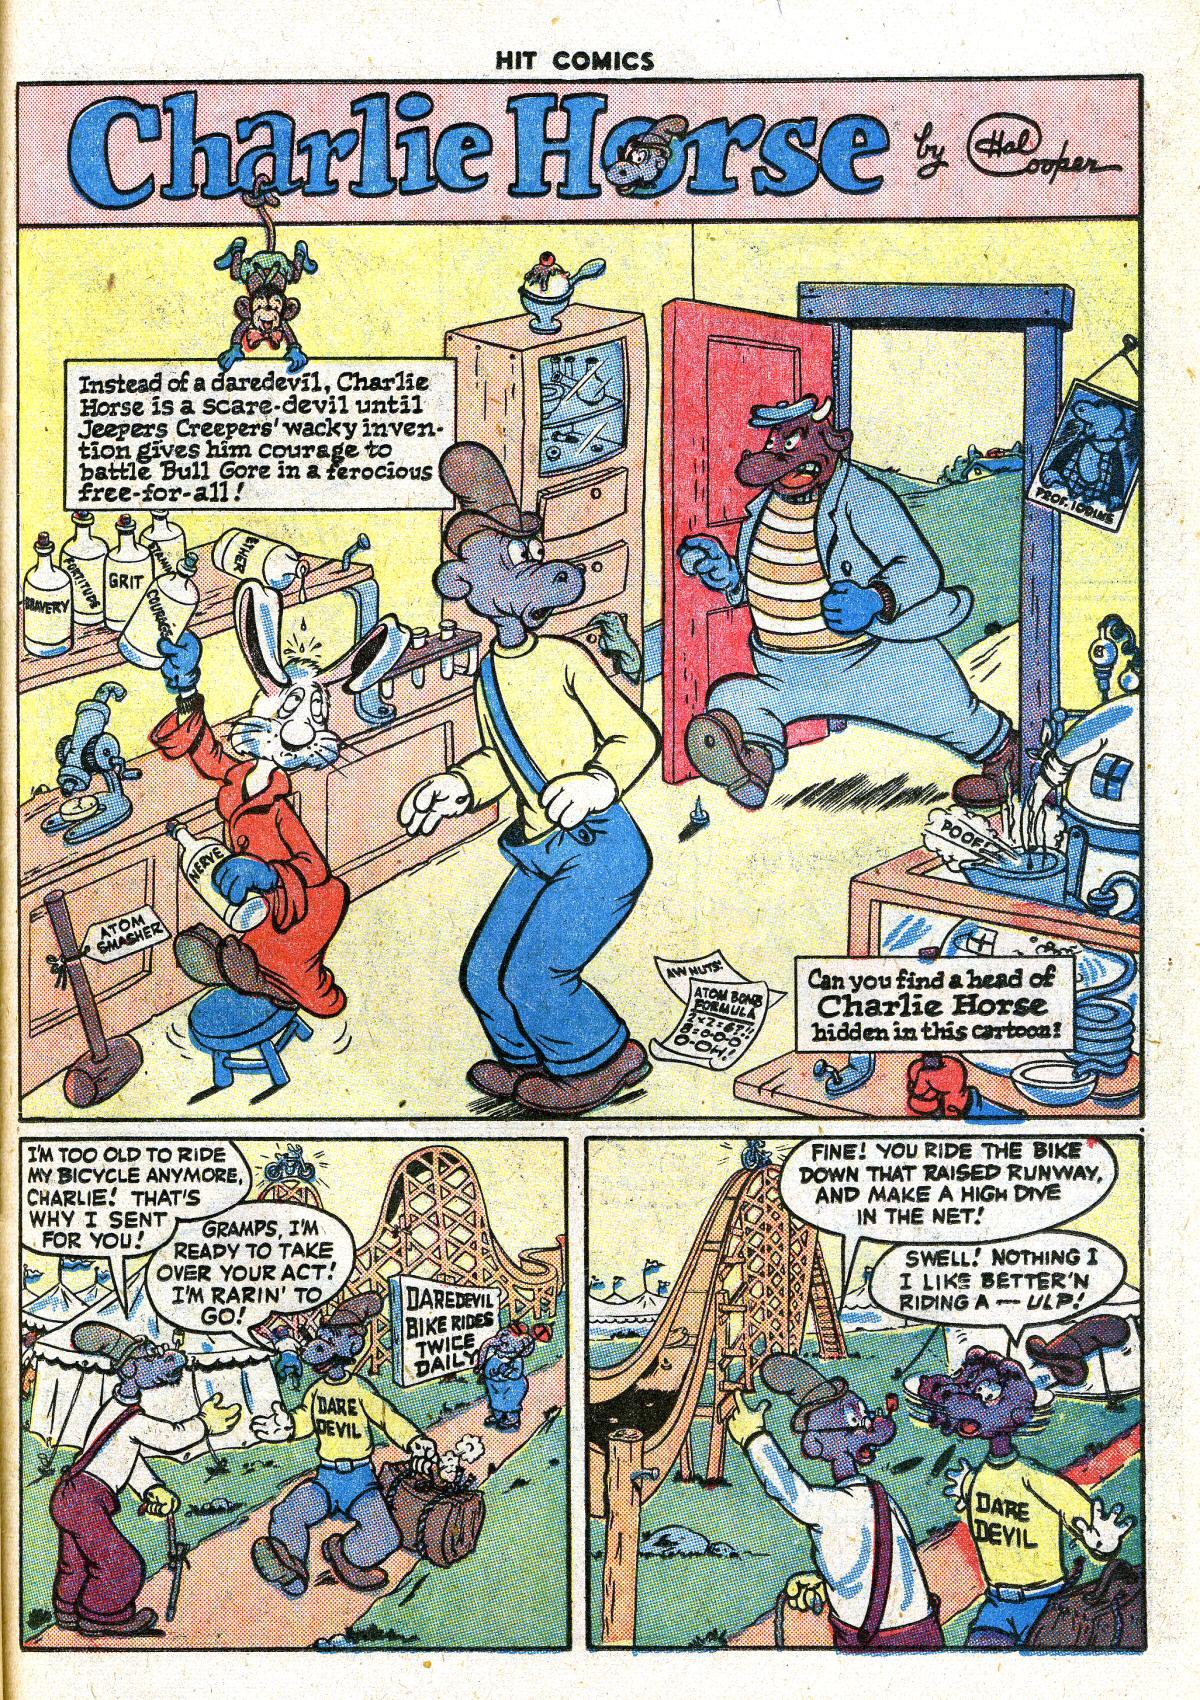 Read online Hit Comics comic -  Issue #41 - 39